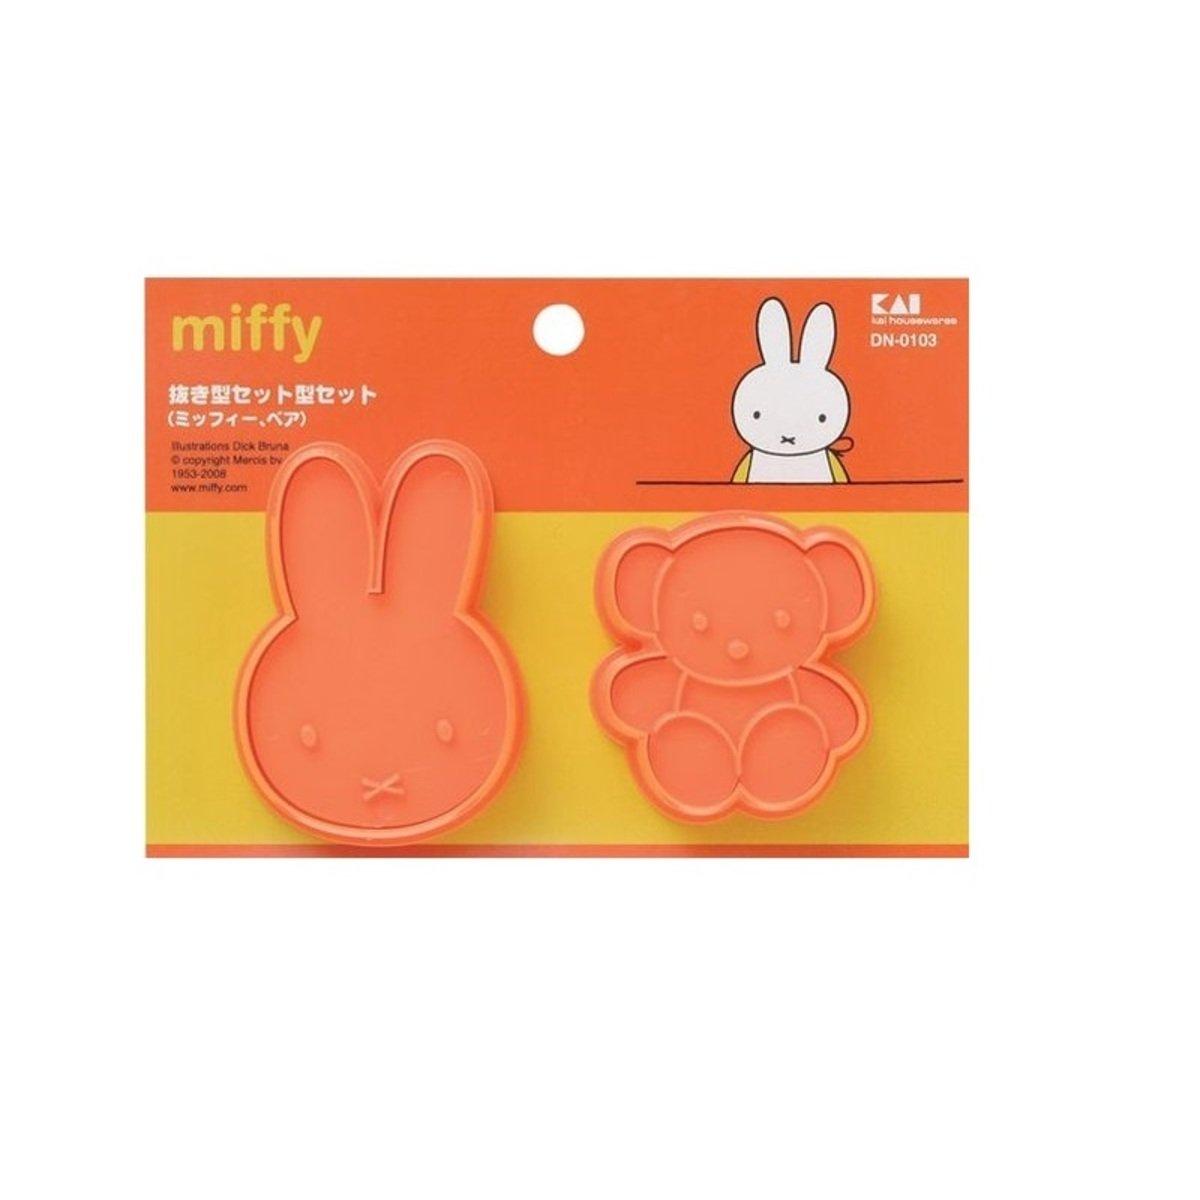 DN-0103 Miffy 曲奇模 (2件裝-Miffy and Bear)